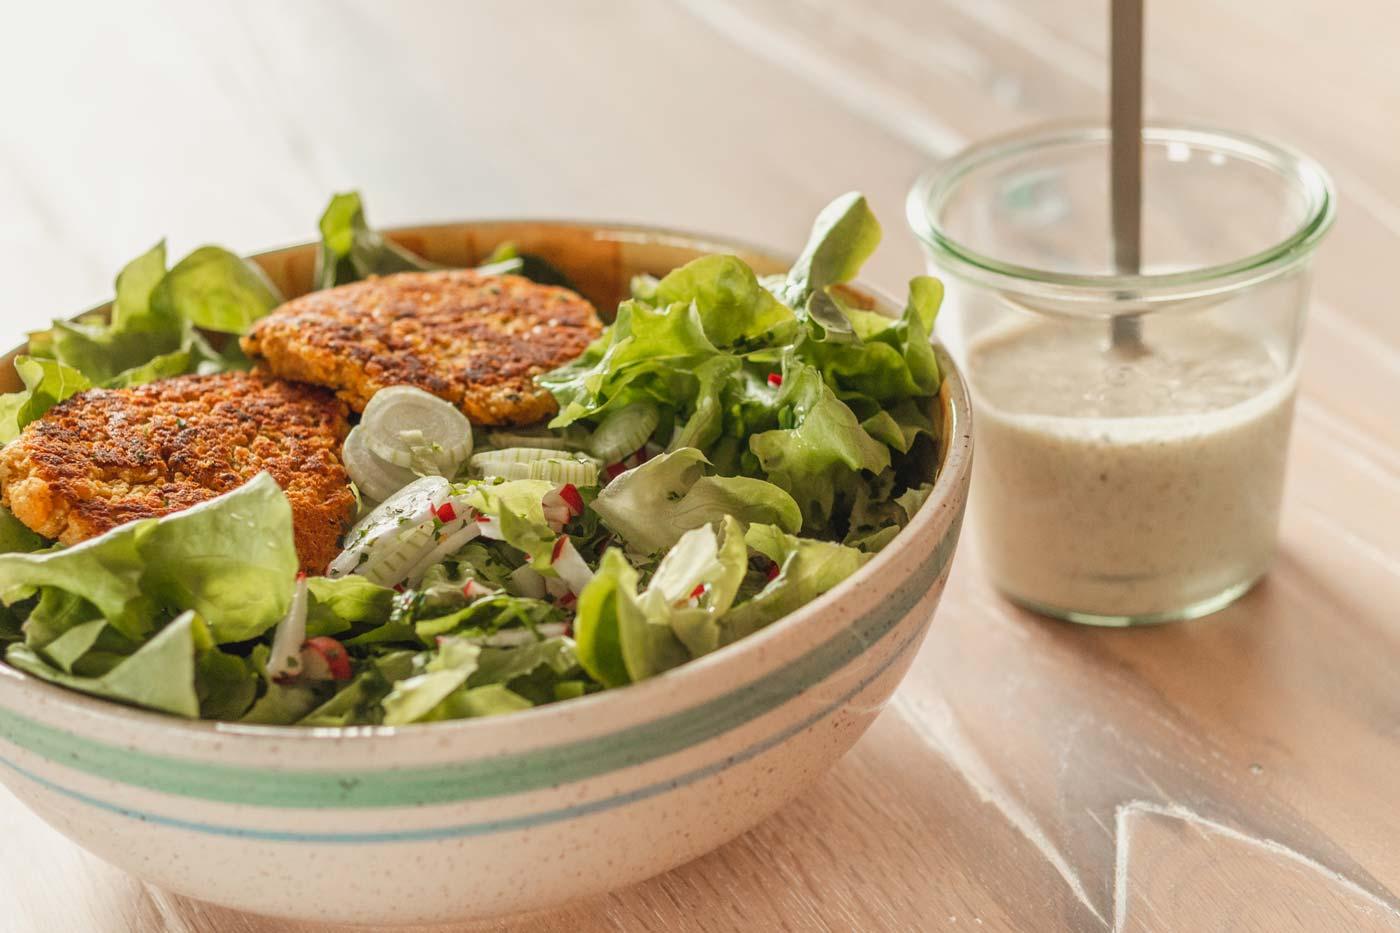 Linsenpuffer mit Salat